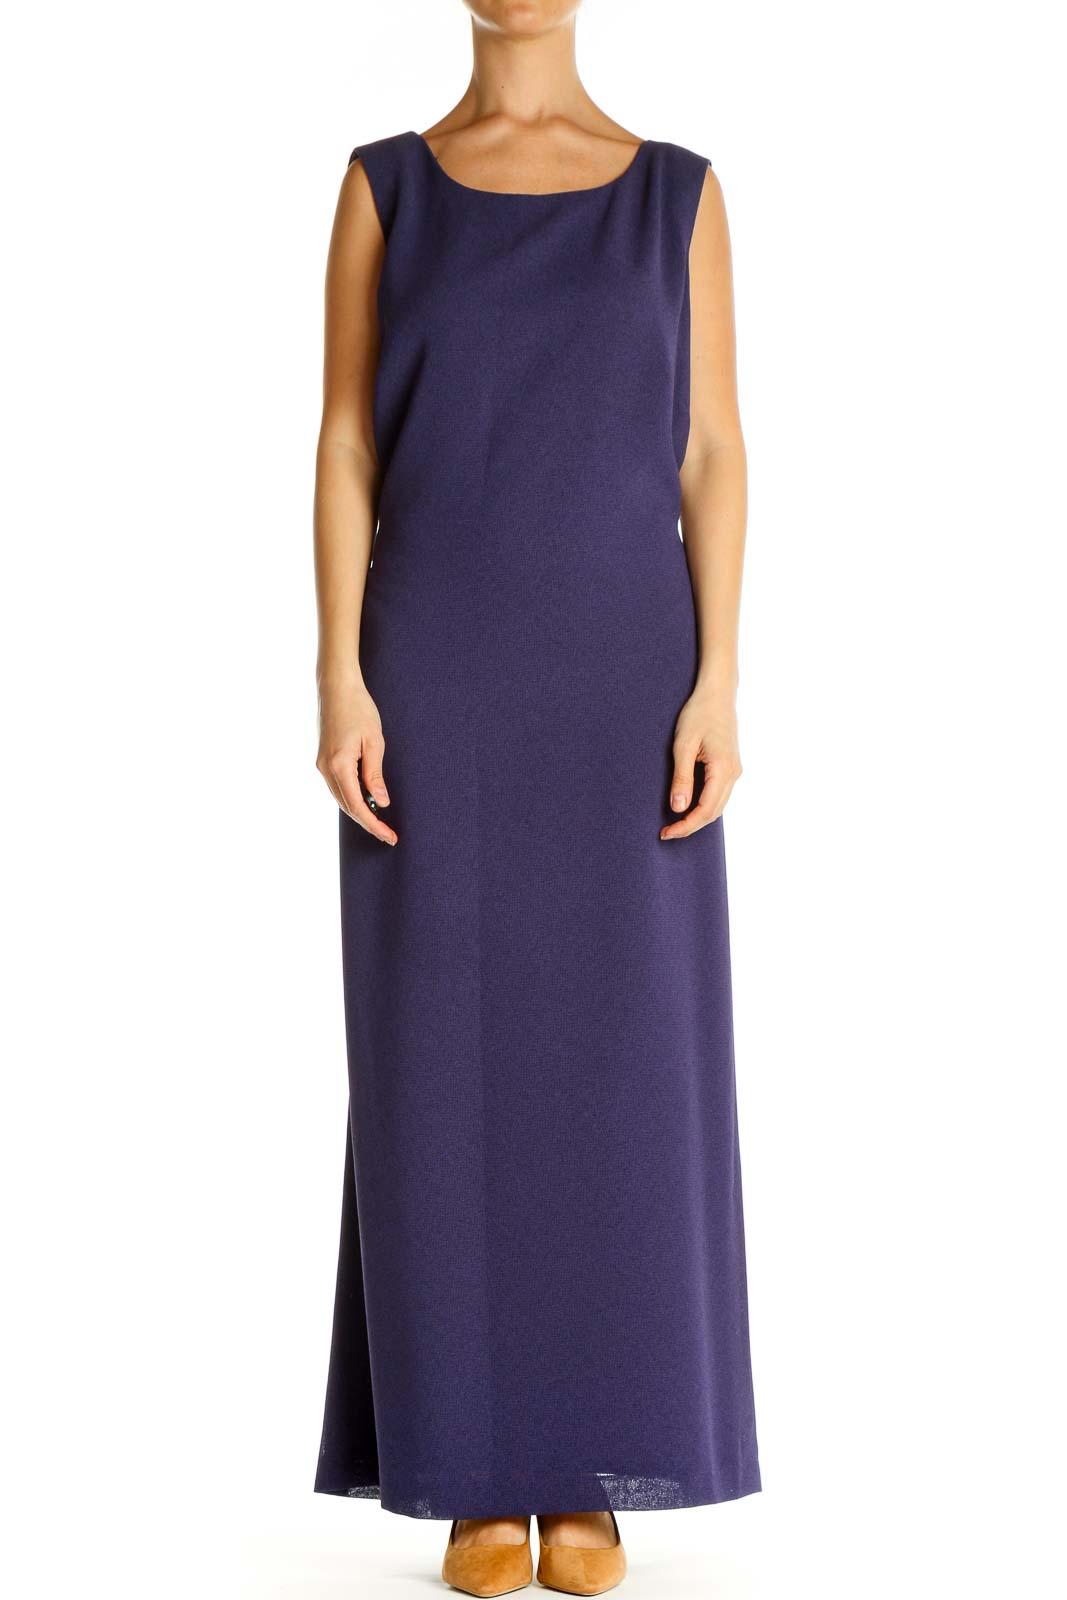 Purple Solid Cocktail Column Dress Front